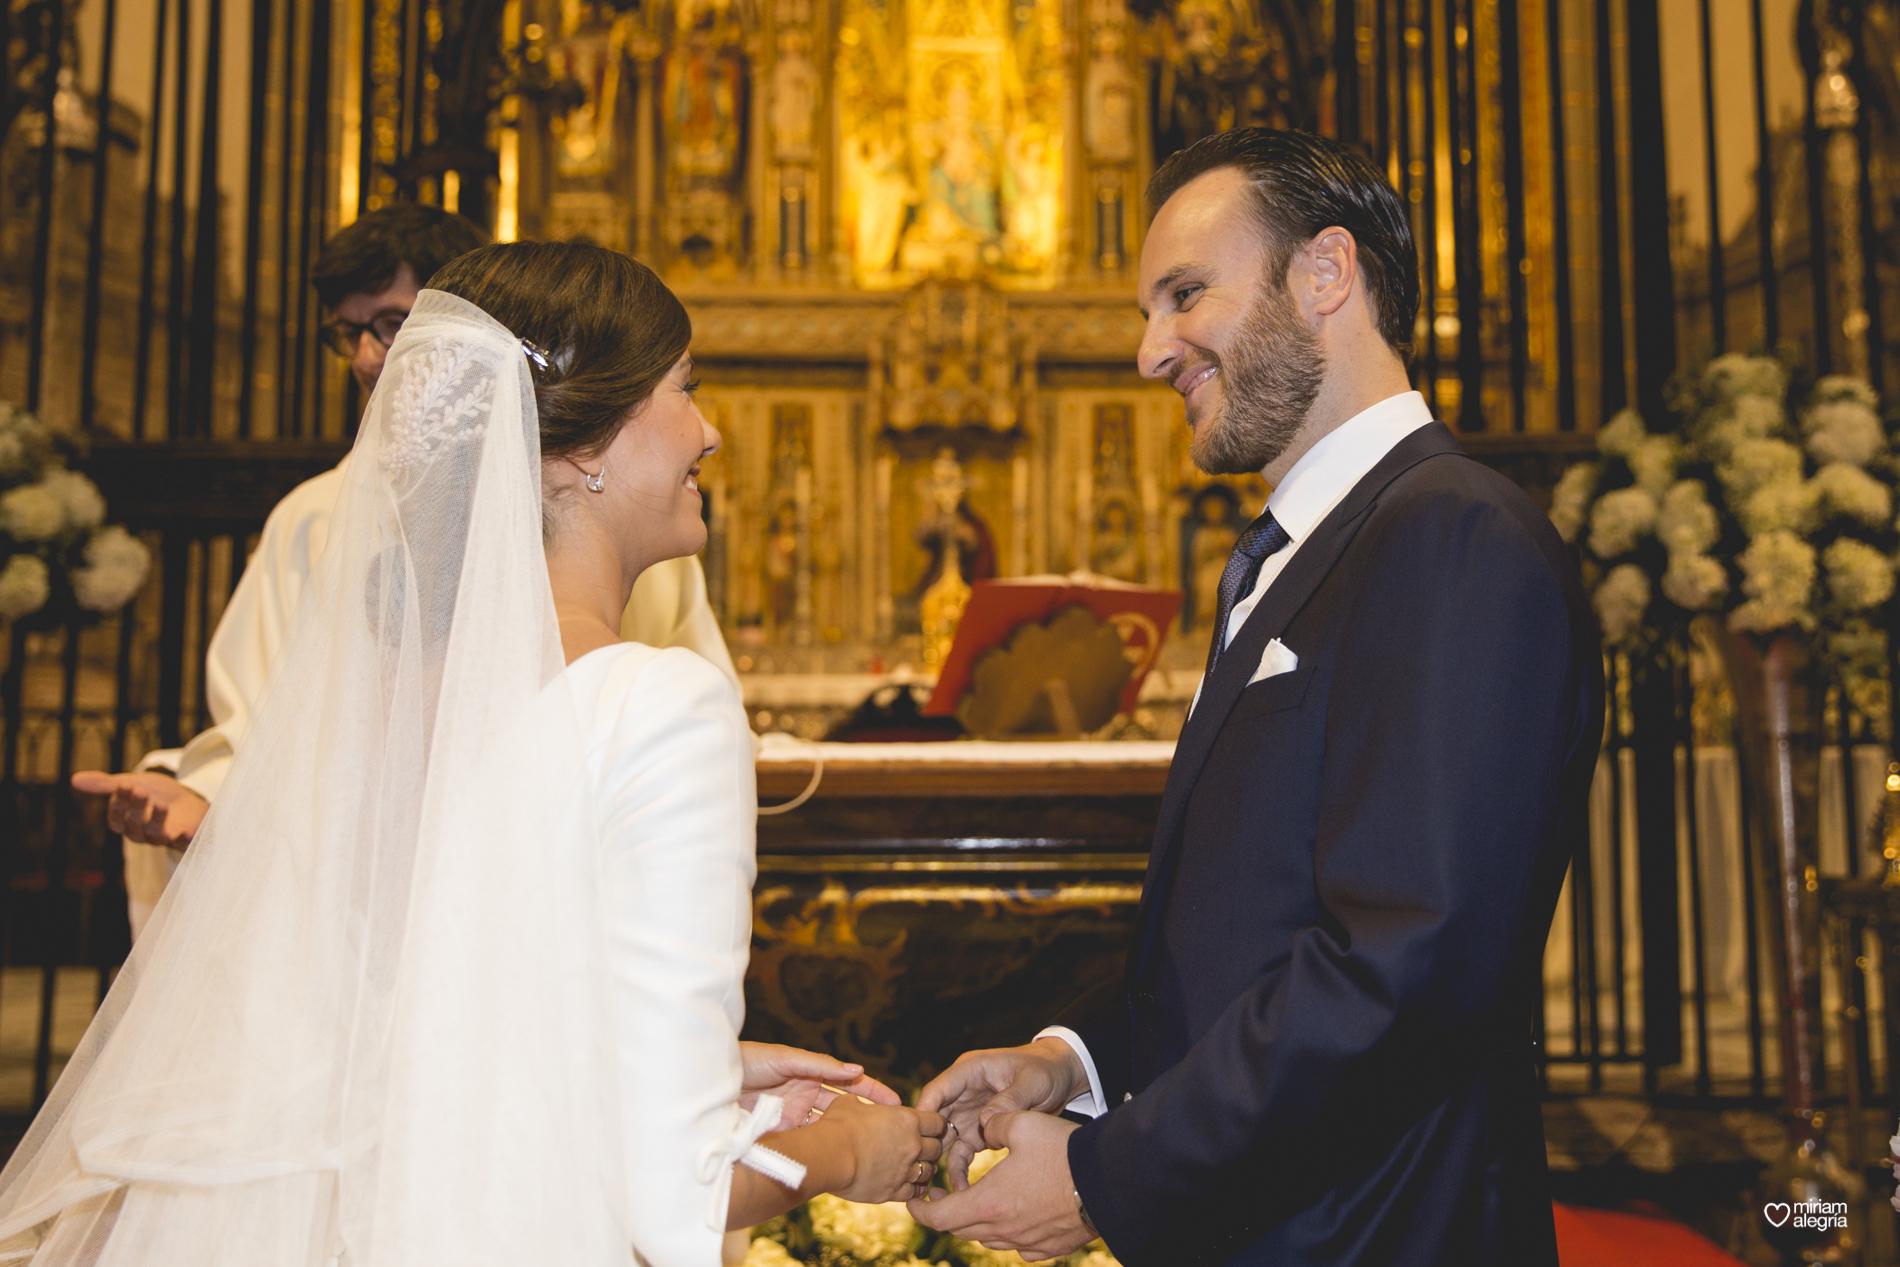 boda-en-la-catedral-de-murcia-miriam-alegria-fotografos-boda-murcia-46